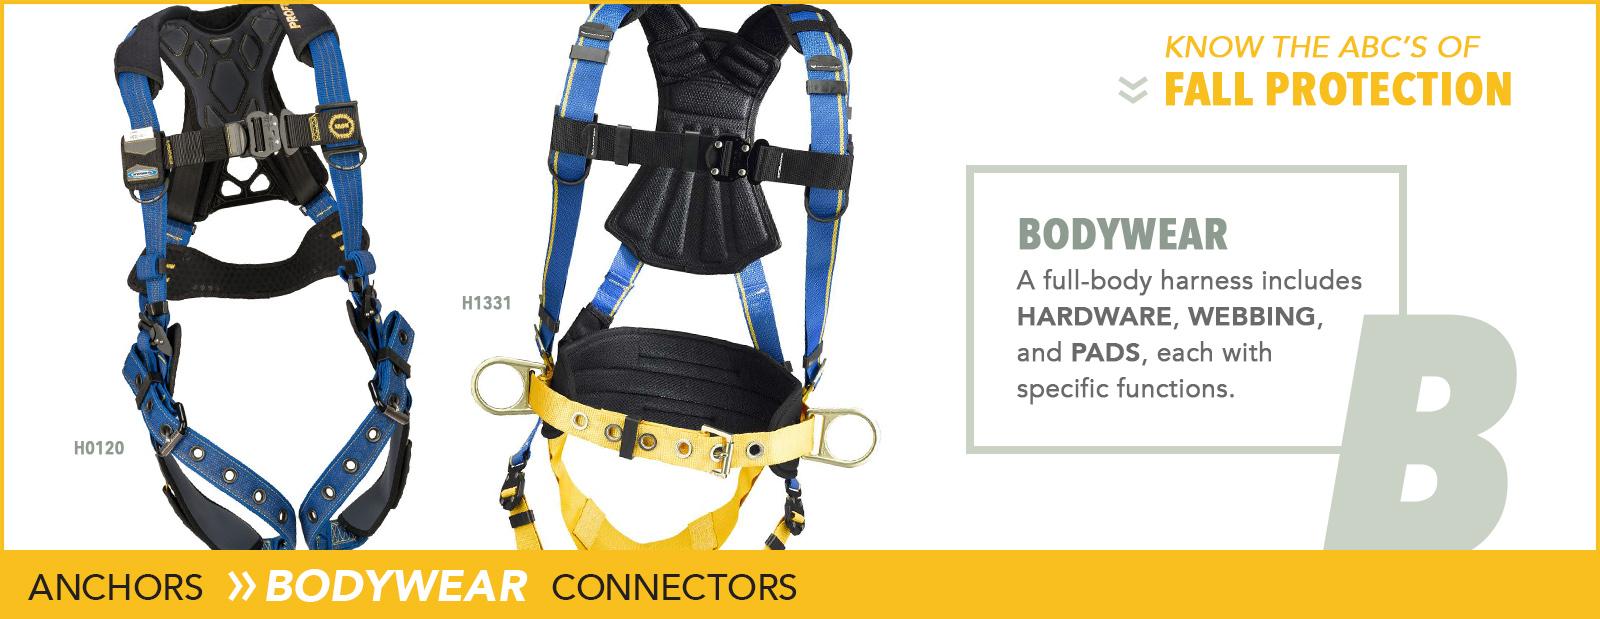 Fall Protection Bodywear